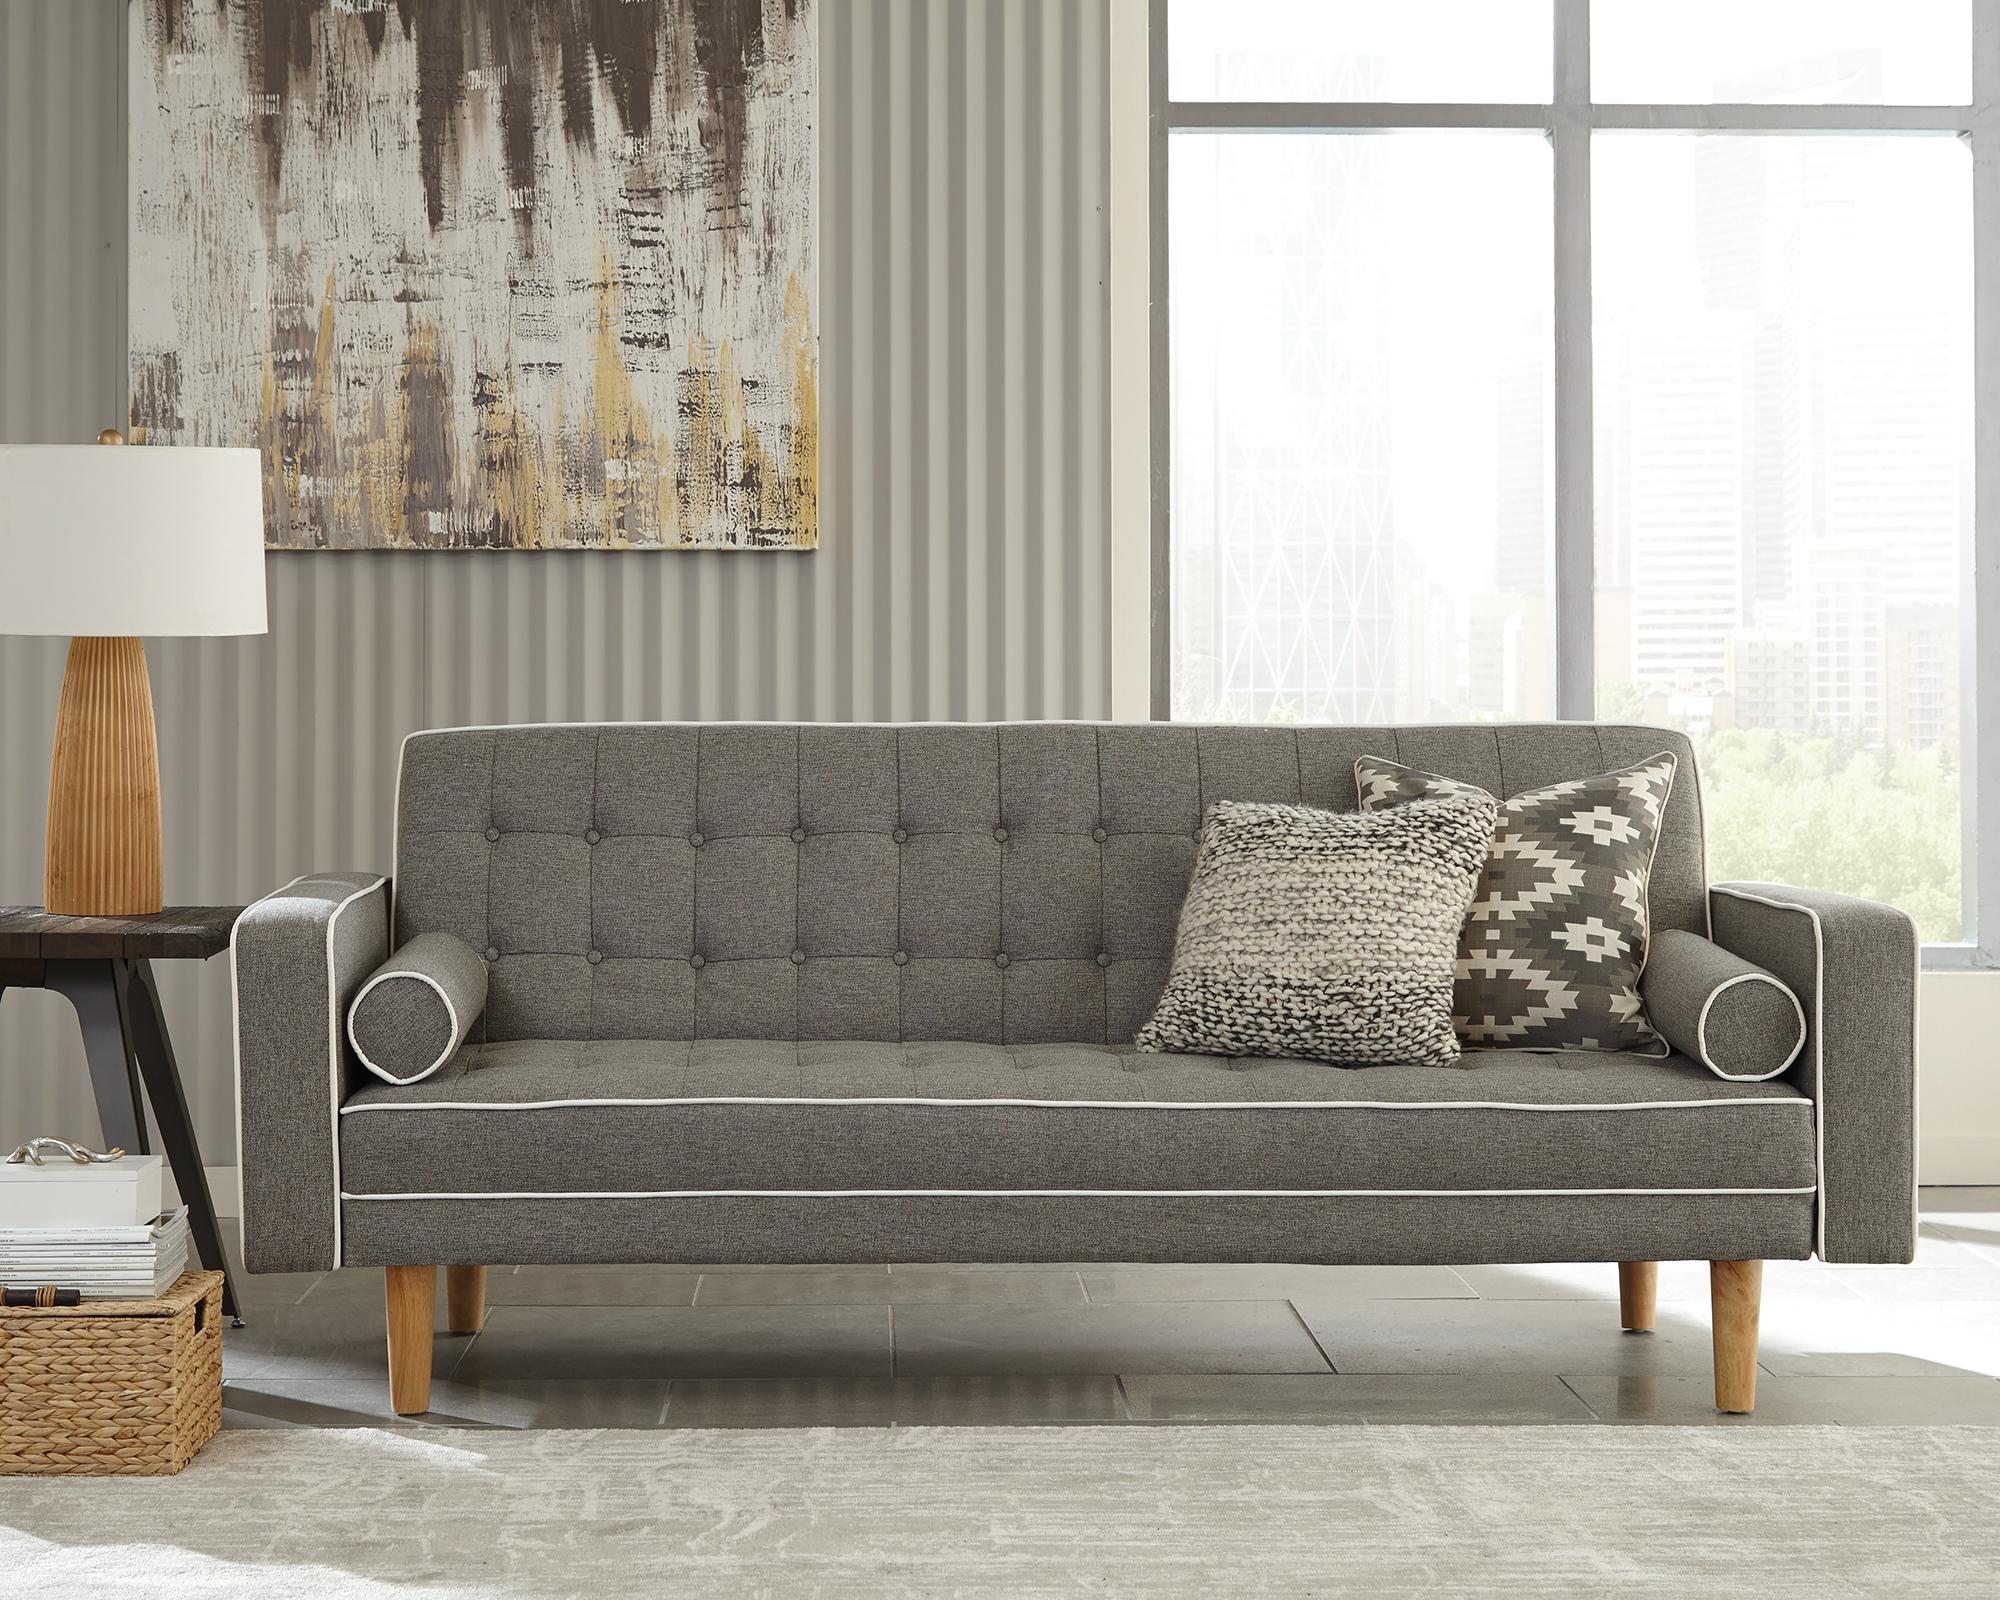 Coaster Fabric Sofa Bed With Grey Finish 360022 Ebay # Muebles Coaster